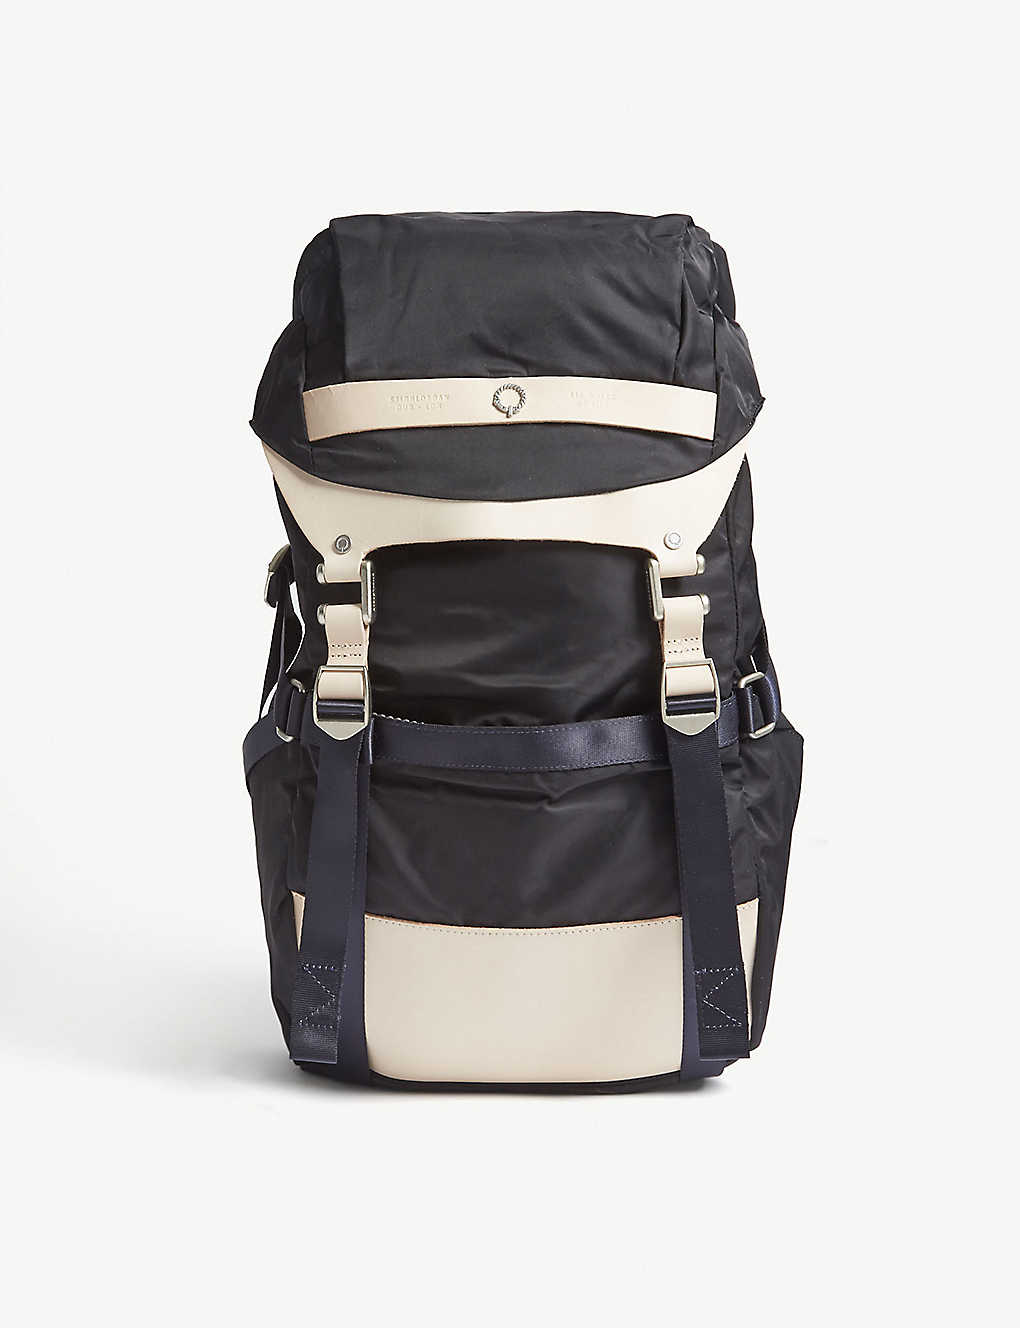 5933a26a2ab2 STIGHLORGAN - Plato backpack